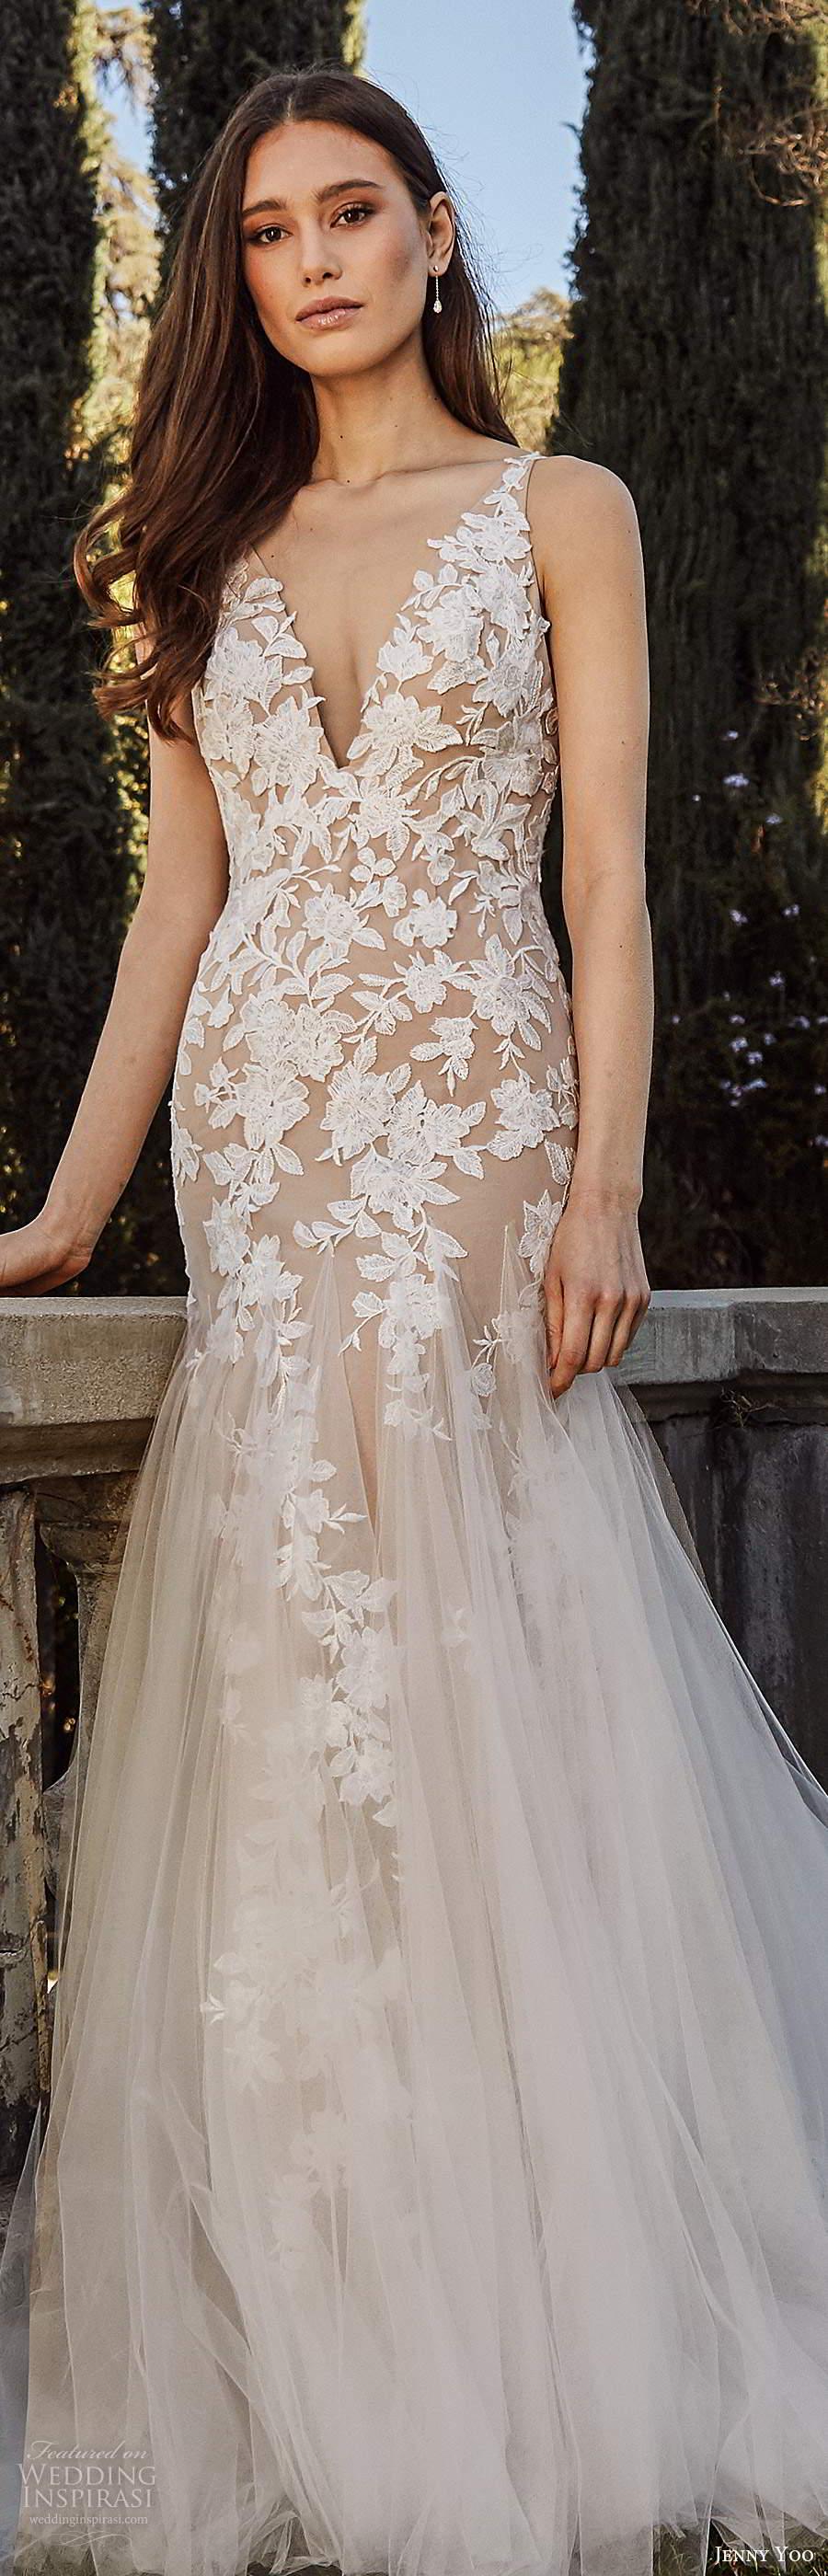 jenny yoo spring 2020 bridal sleeveless straps v neckline embellished bodice mermaid fit flare blush wedding dress chapel train (3) lv